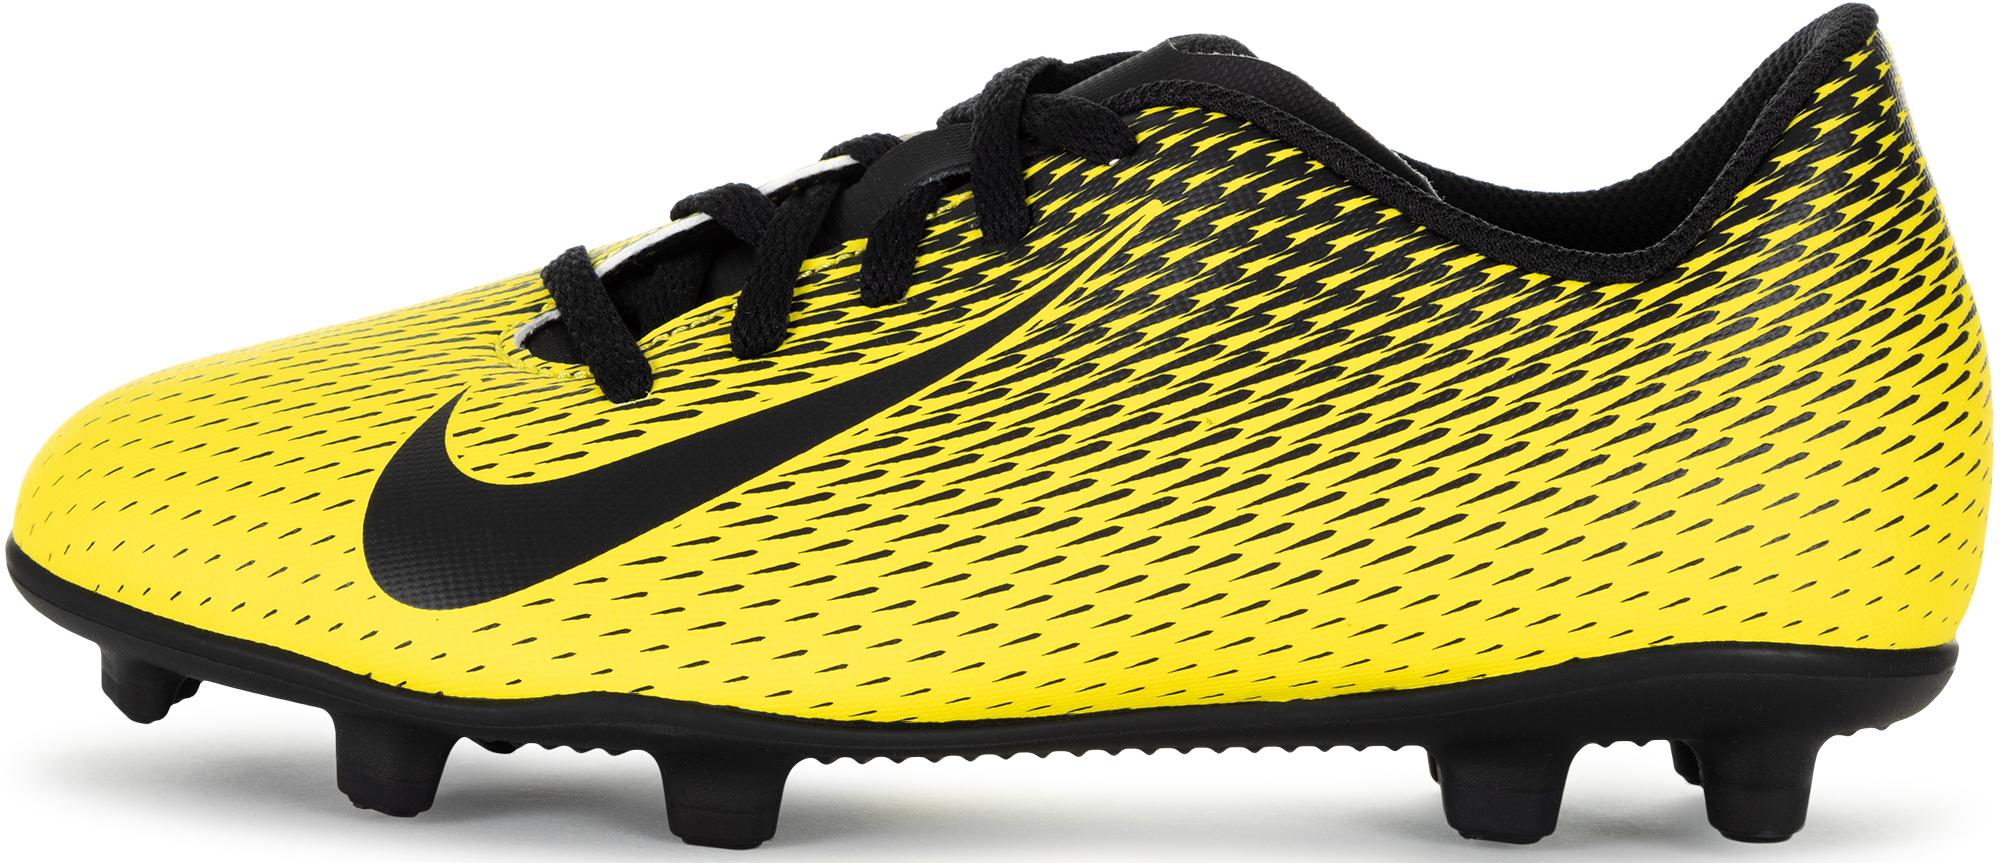 Nike Бутсы для мальчиков Nike Bravata II FG, размер 34